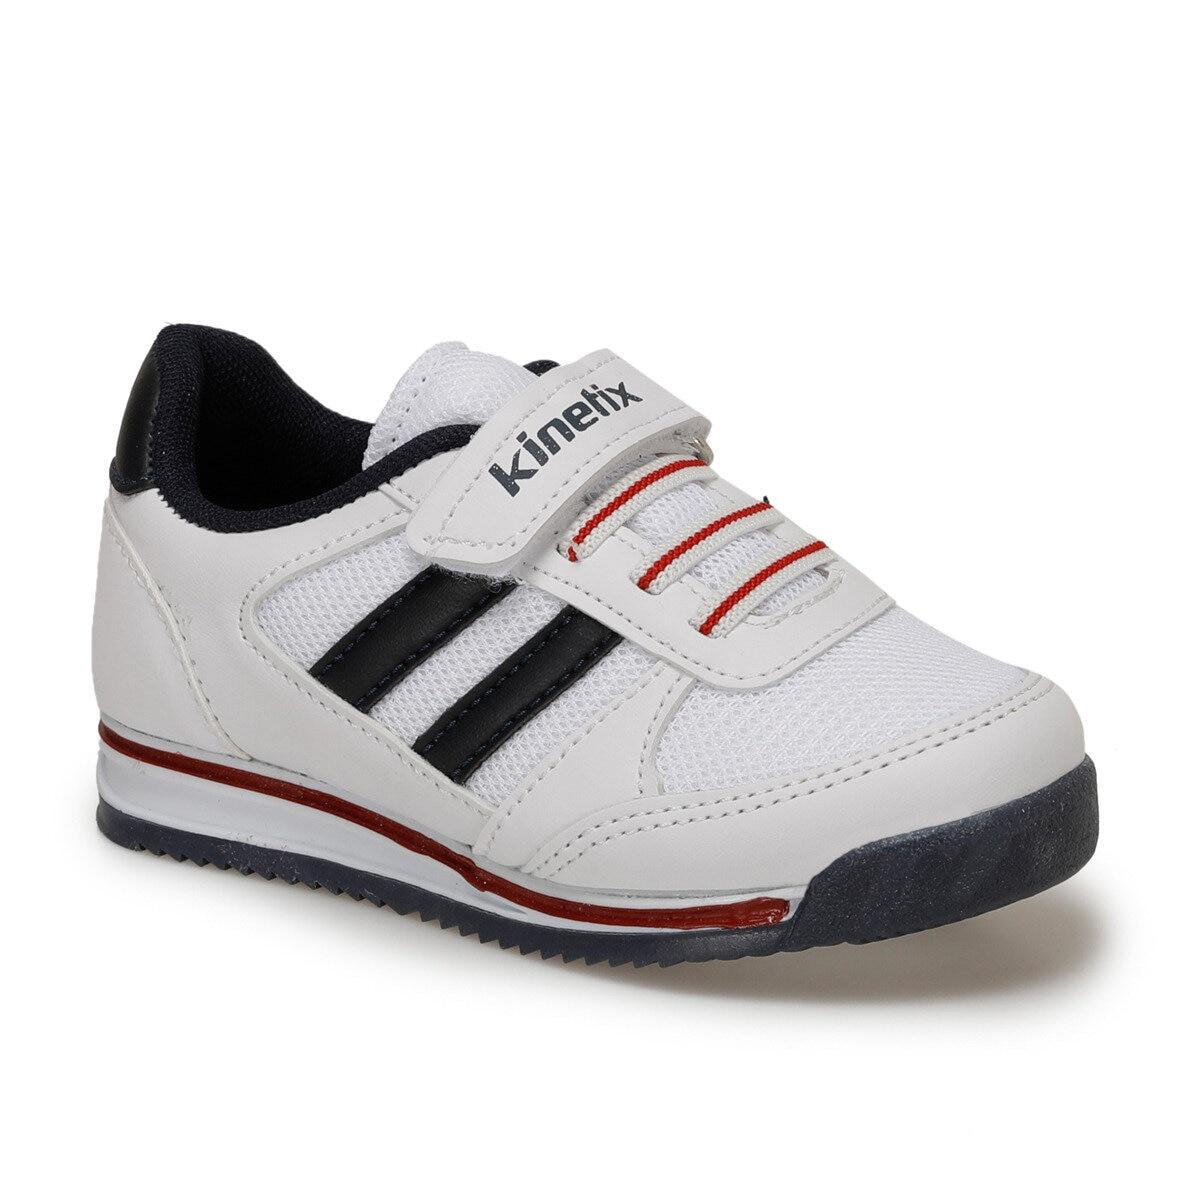 FLO TRAMOR White Male Child Hiking Shoes KINETIX